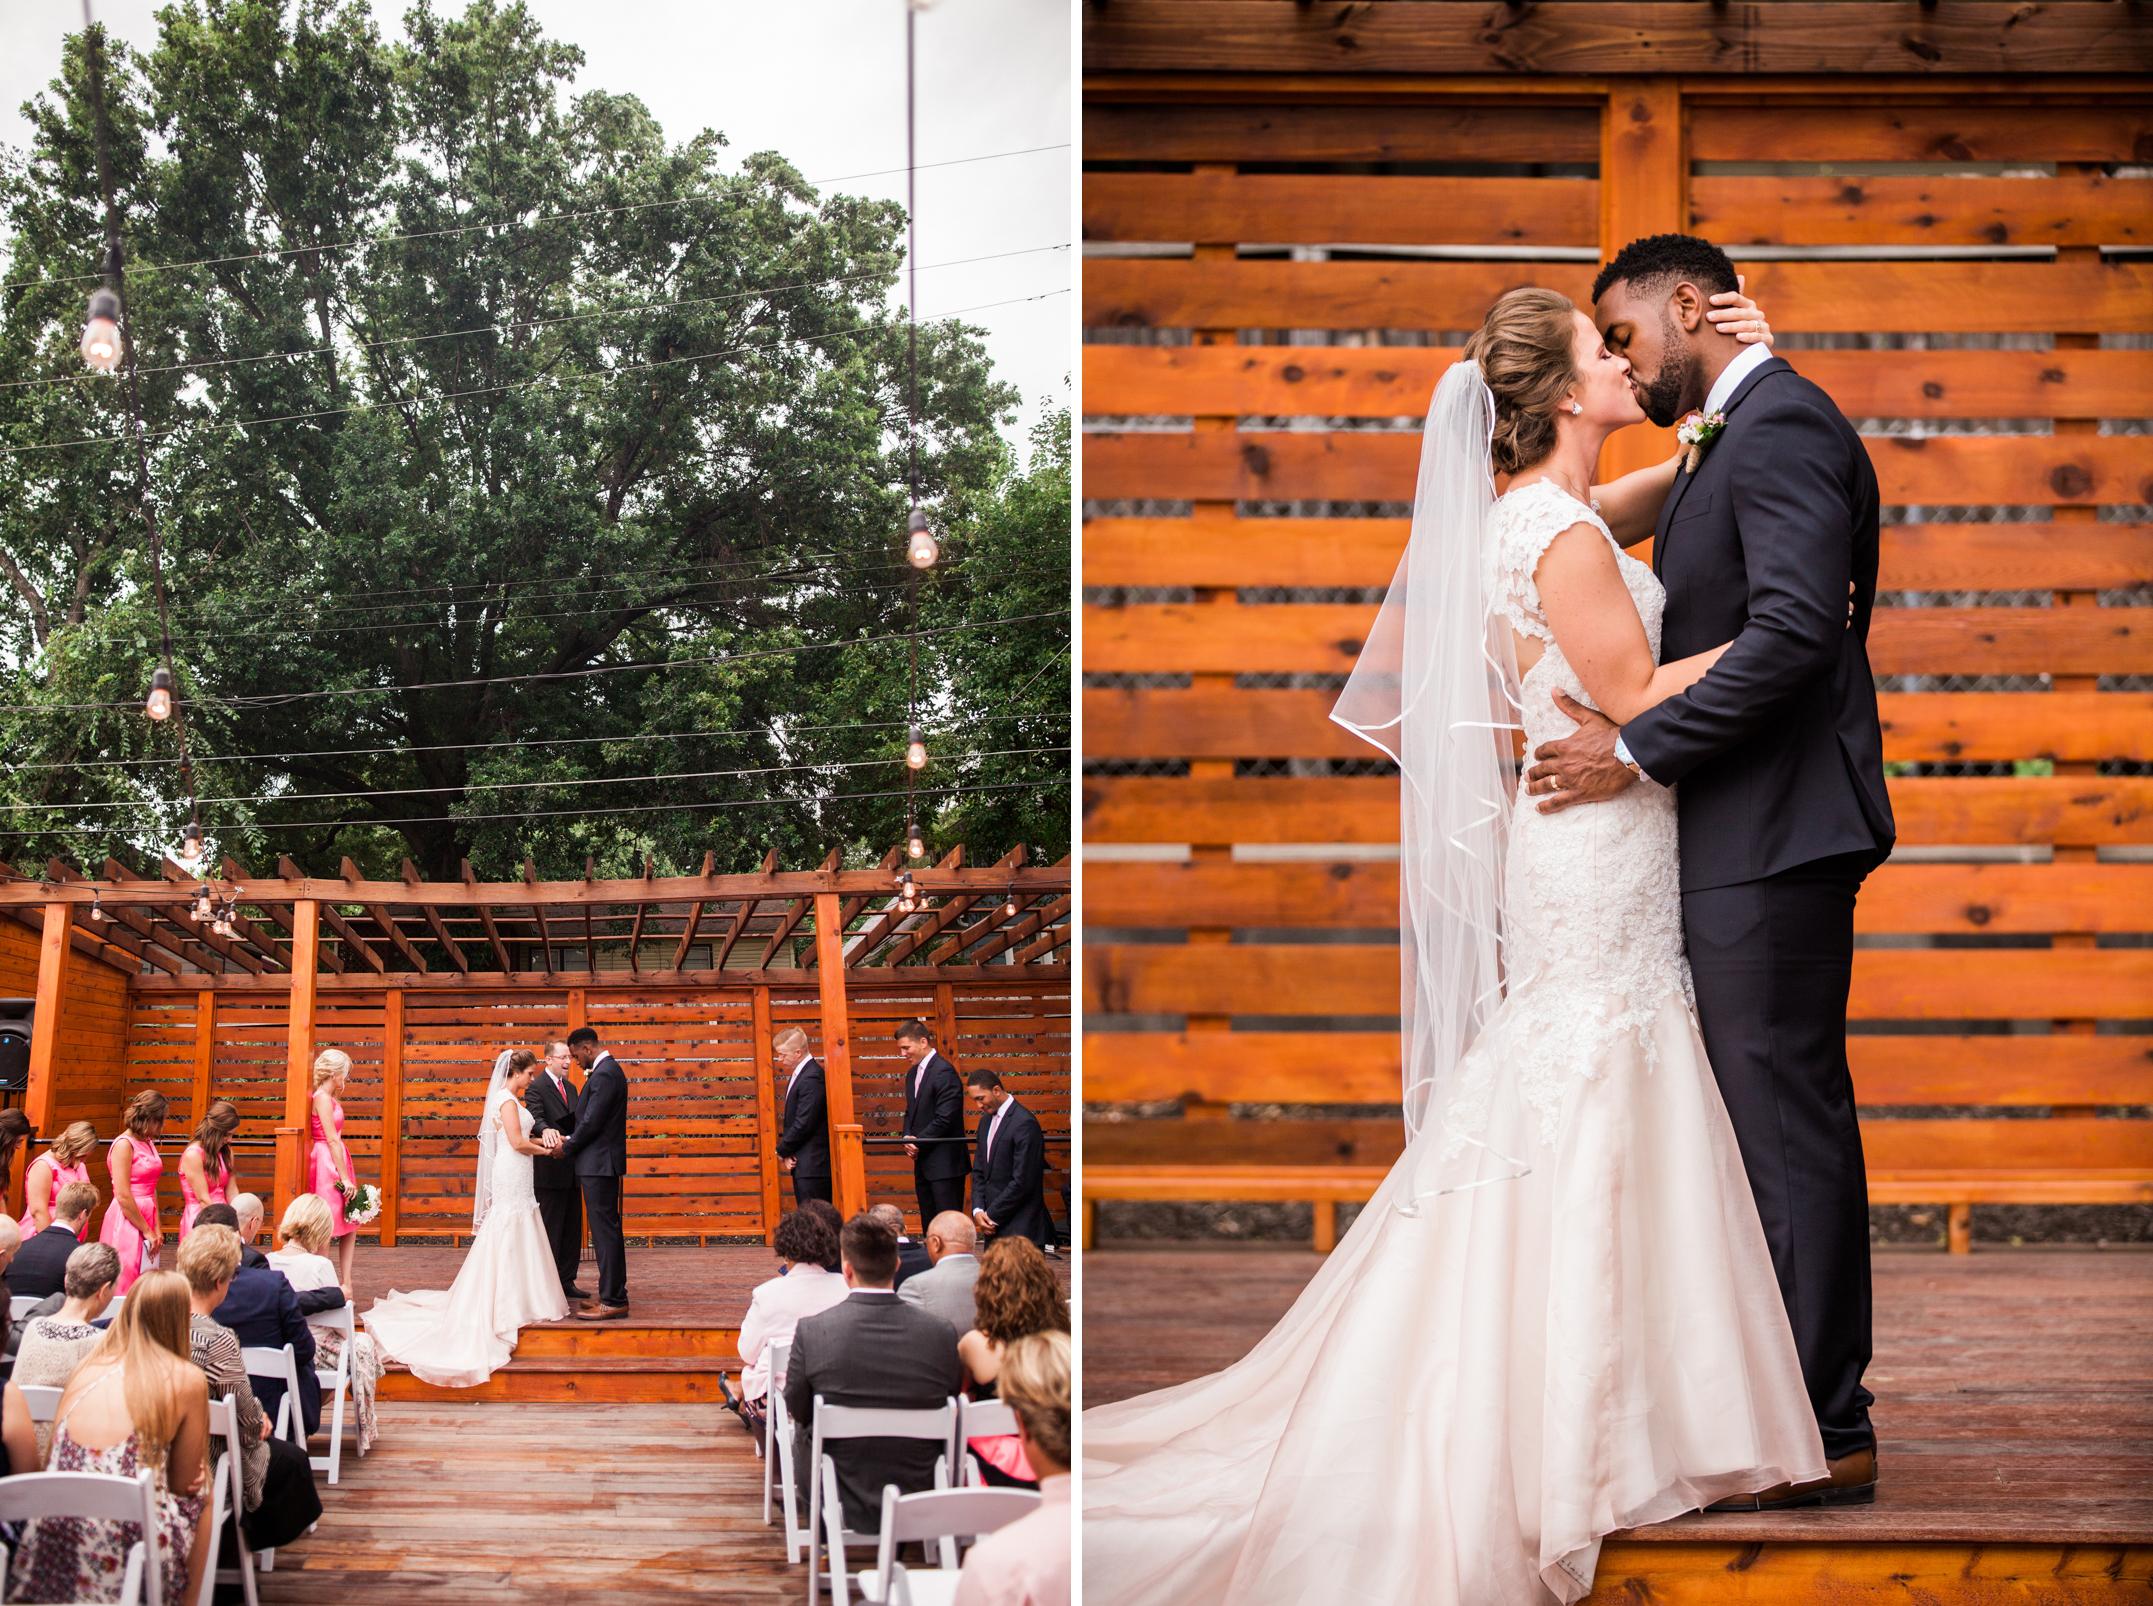 LegacyUnion-Wedding-Photographer-Glendale-CA-161 copy.jpg